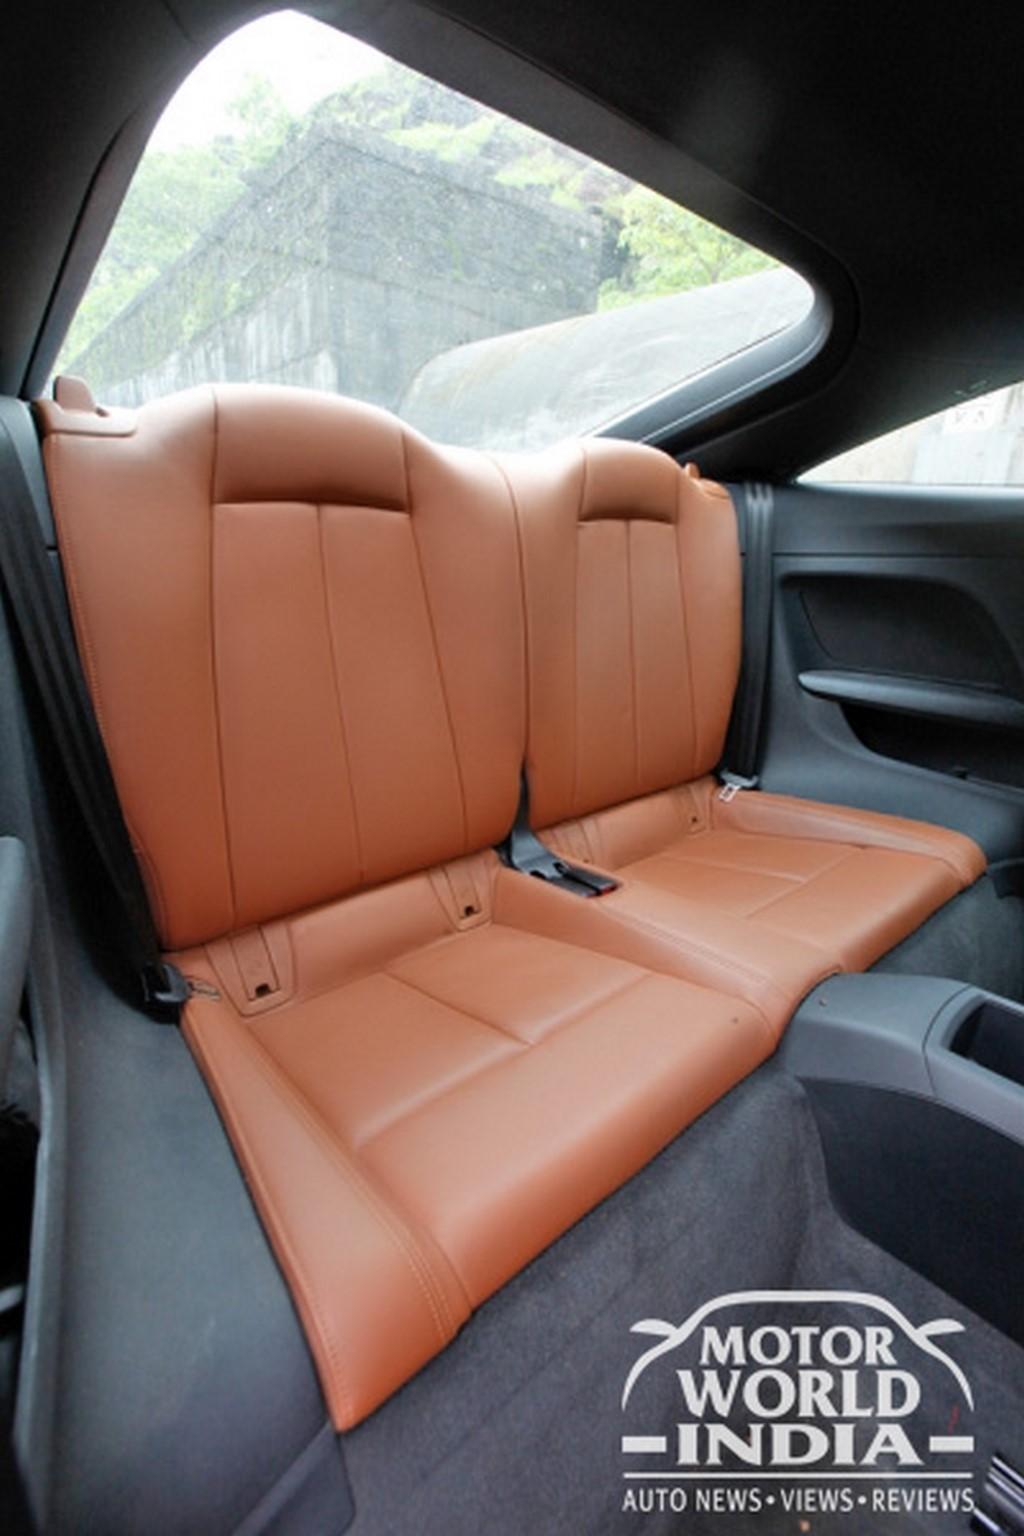 Audi-TT-Interior-Rear-Seat